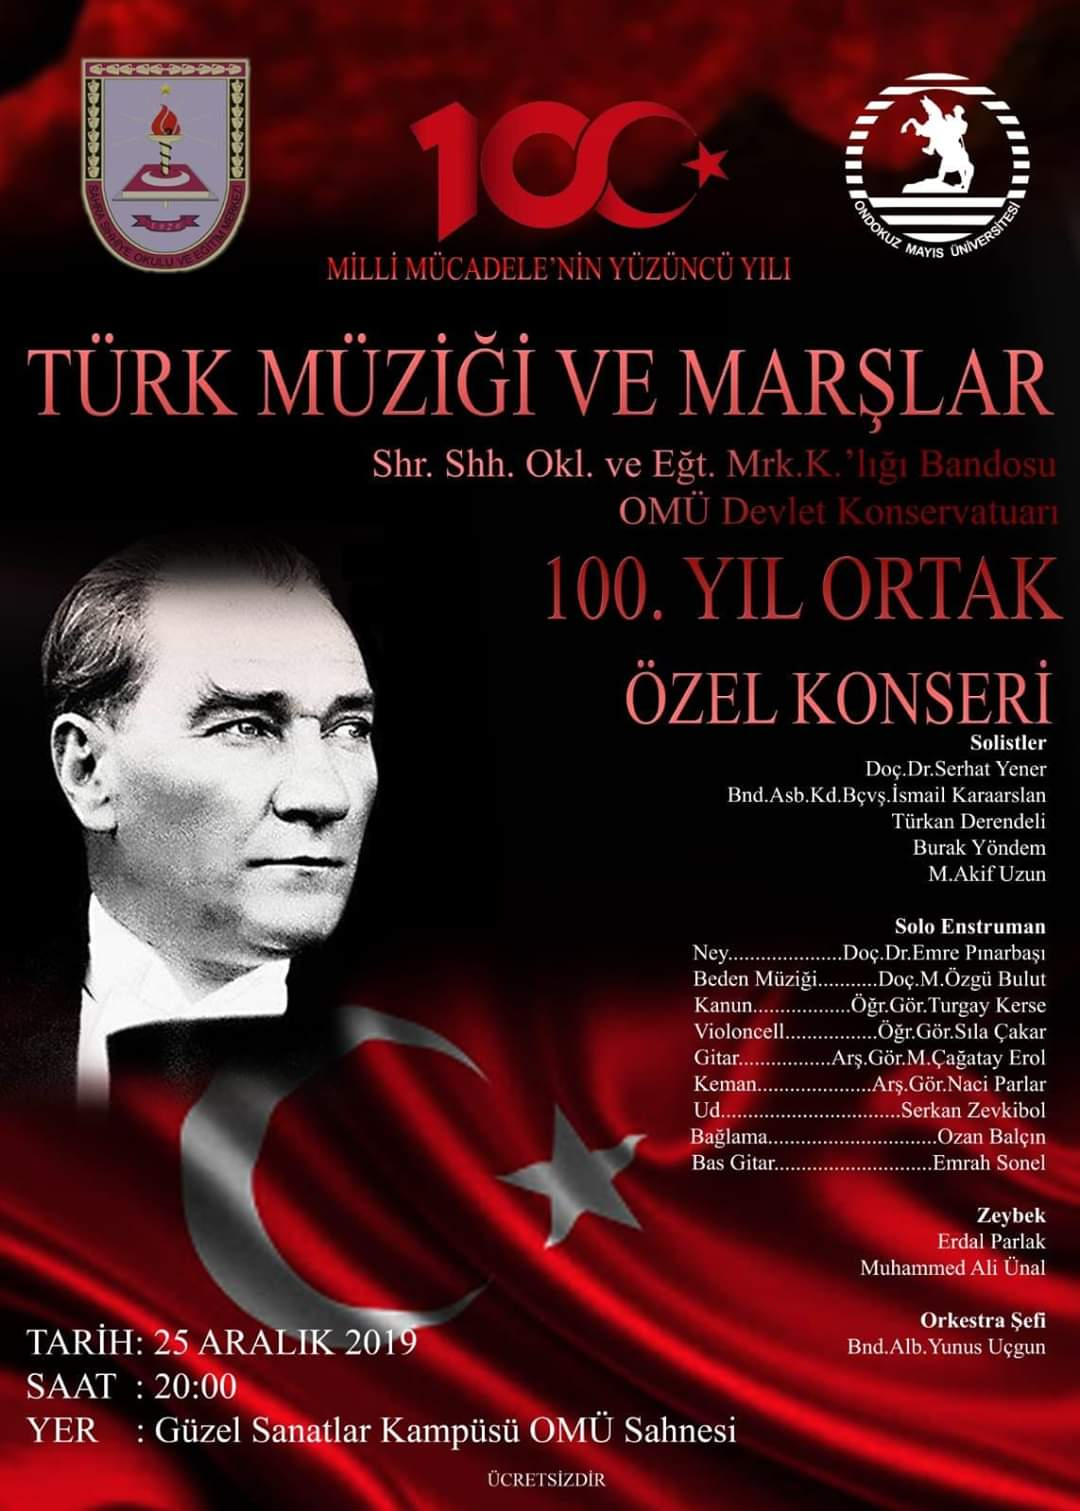 https://www.omu.edu.tr/sites/default/files/turk_muzigi_ve_marslar.jpeg